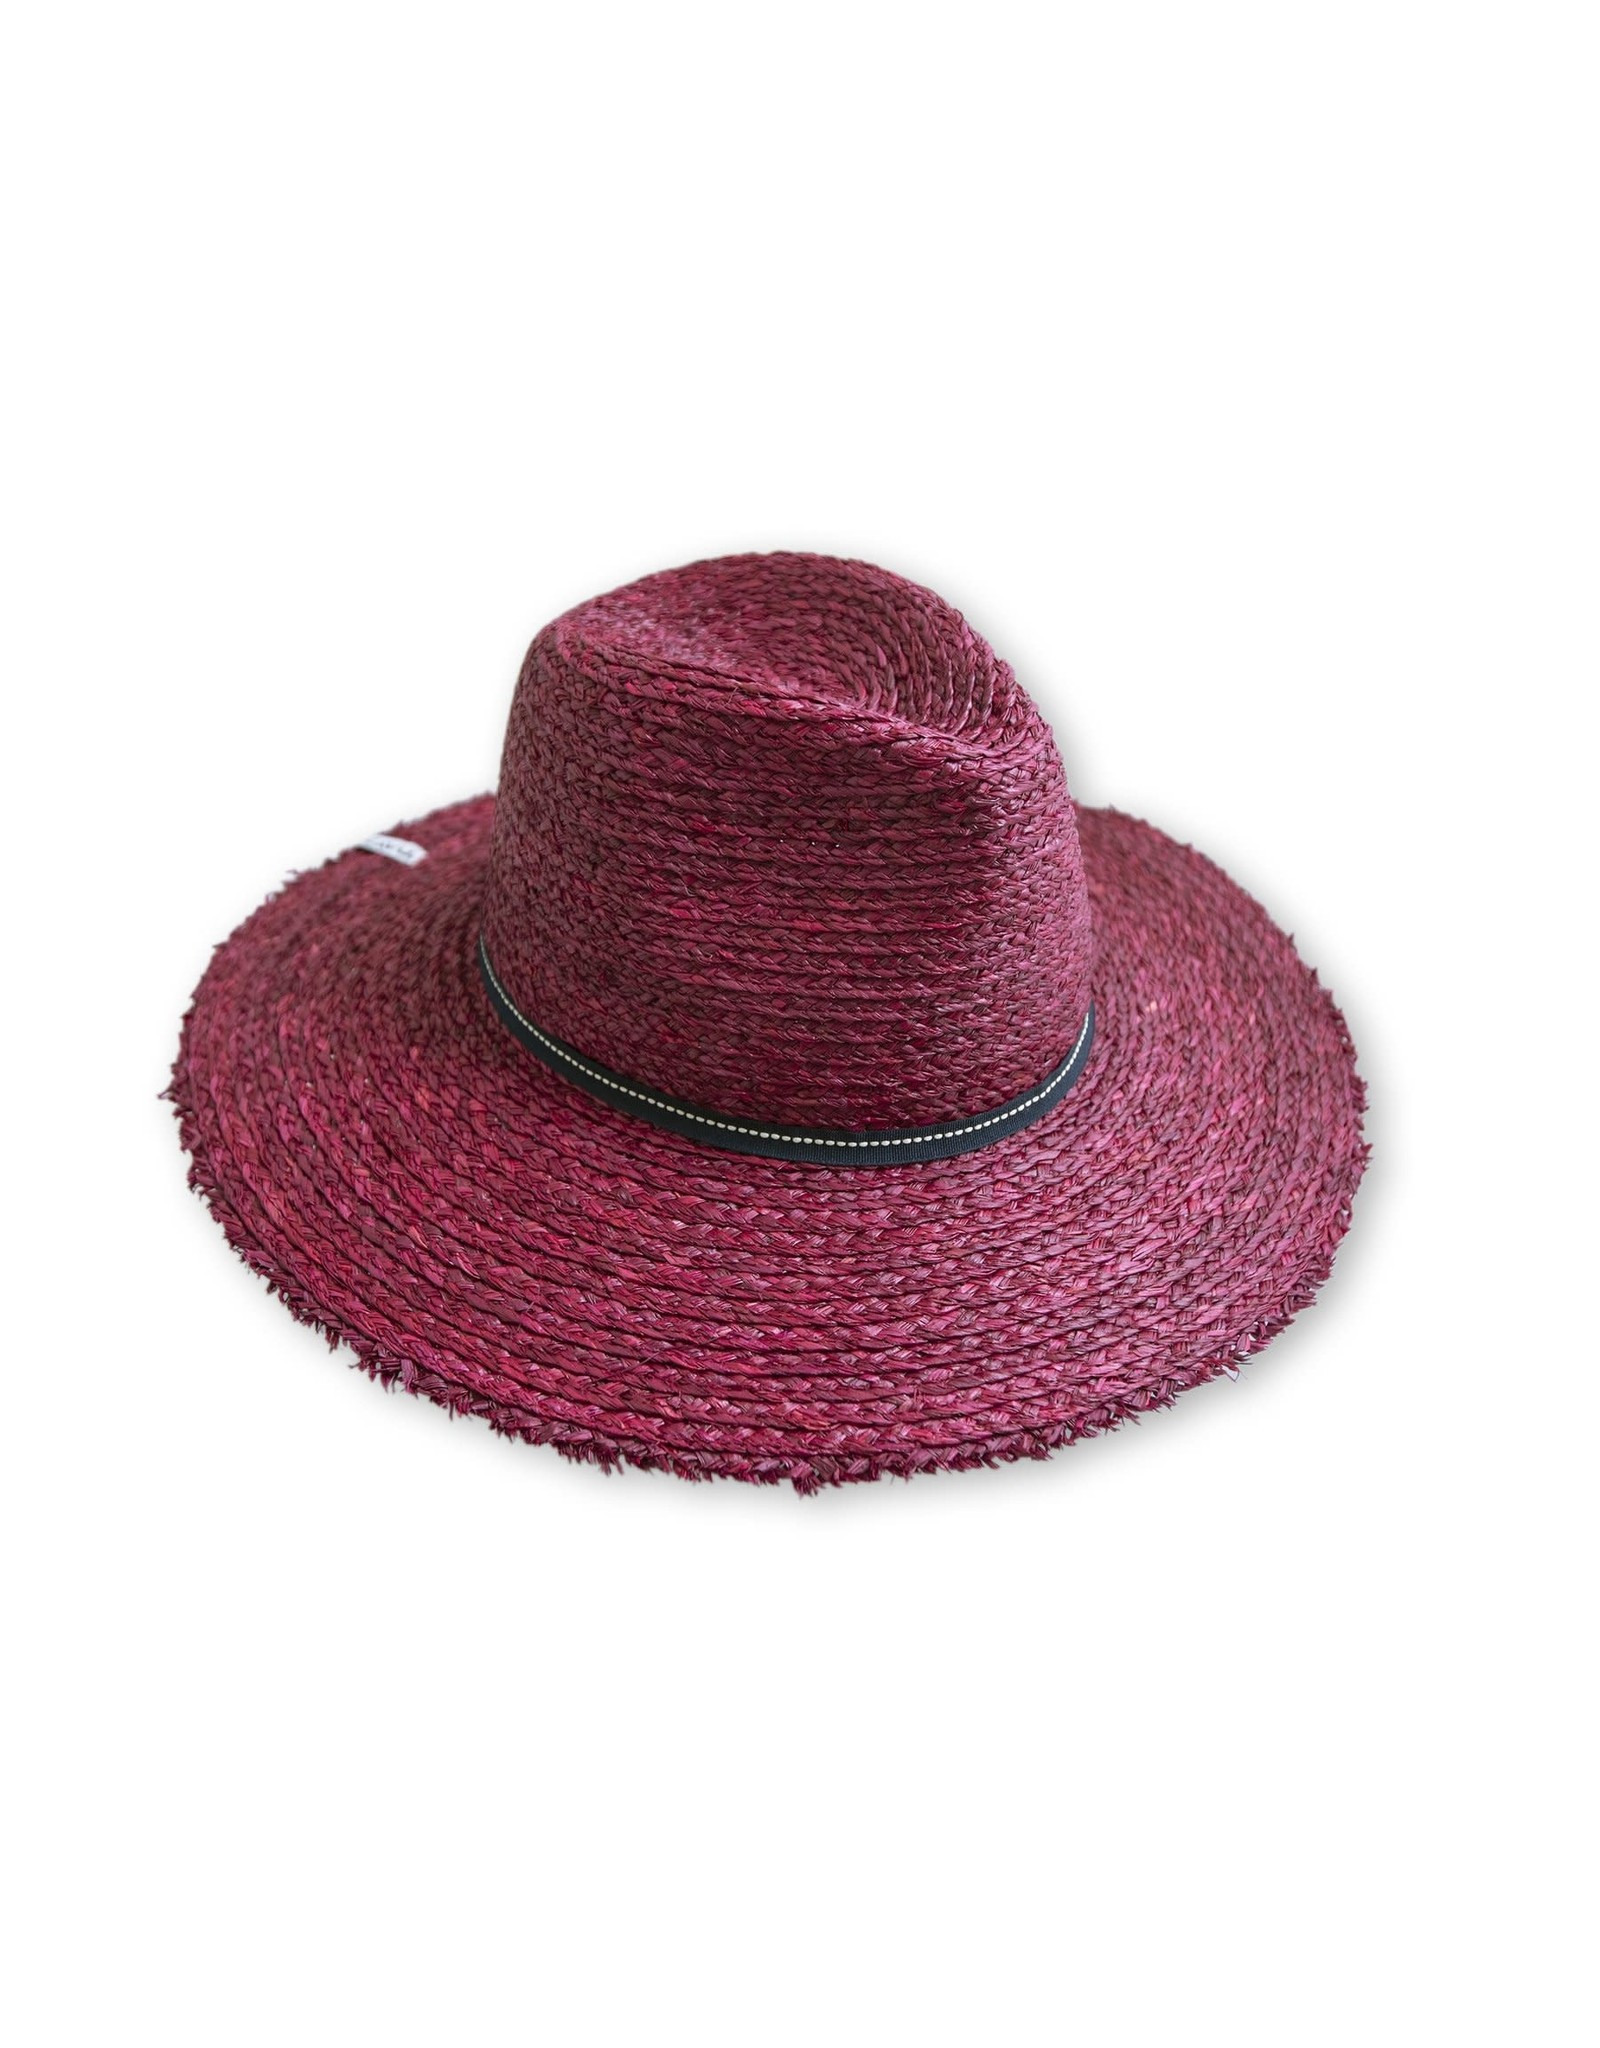 Kavu Kavu Flores Long Brimmed Sun Hat: Rio Red